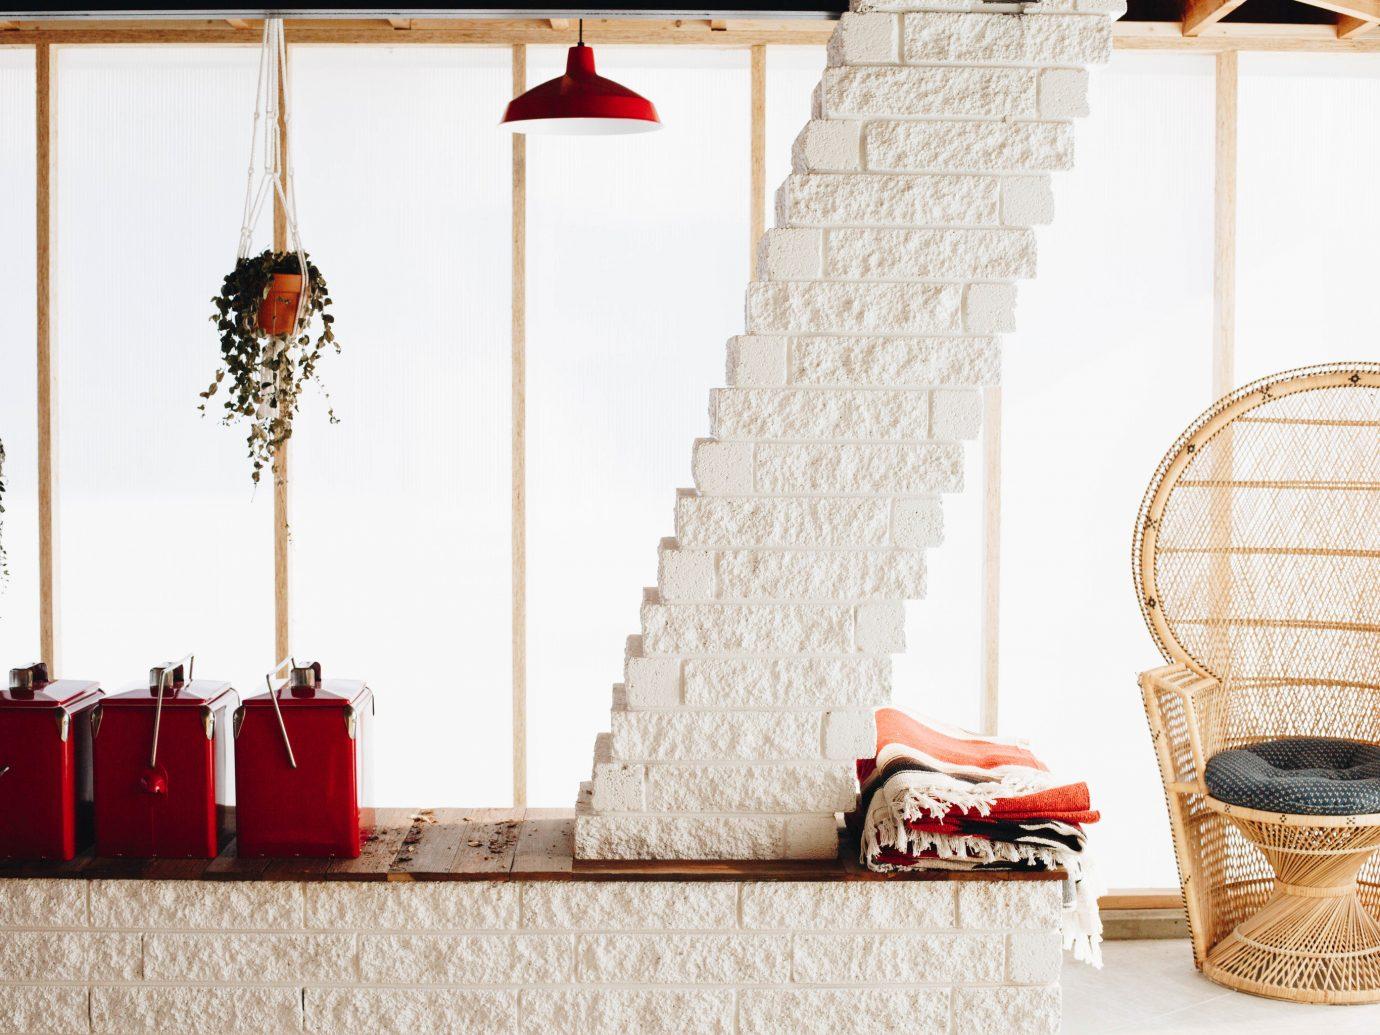 Hotels Style + Design Trip Ideas indoor furniture interior design table flooring product design floor lamp chair